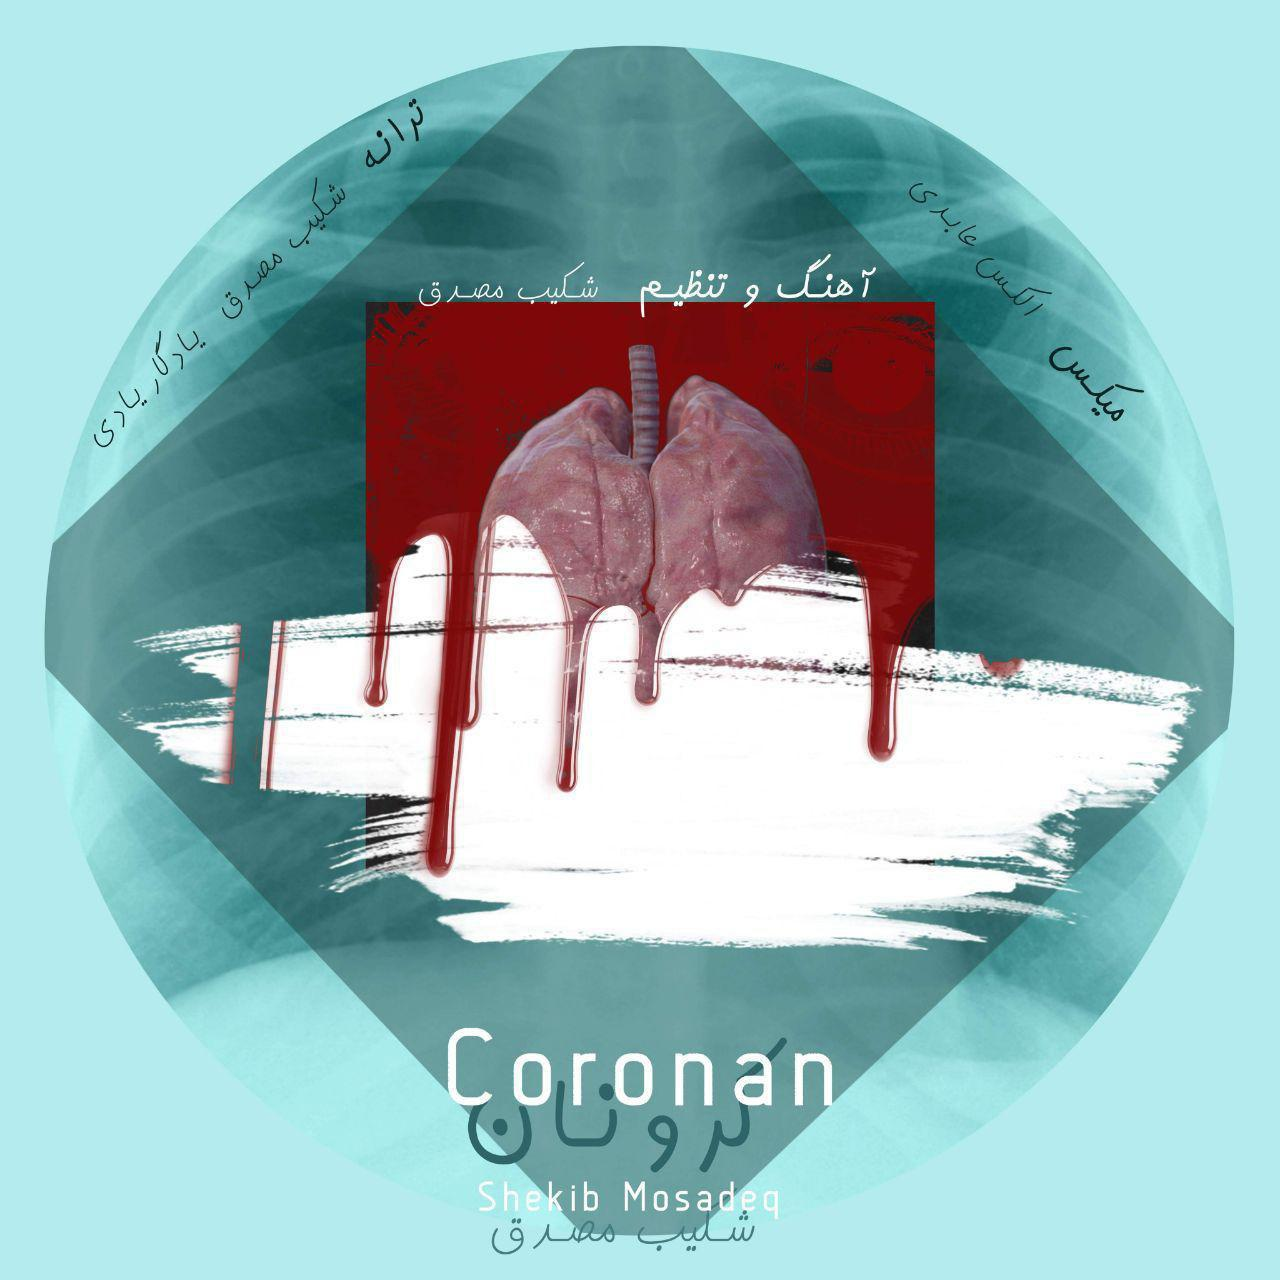 Coronan